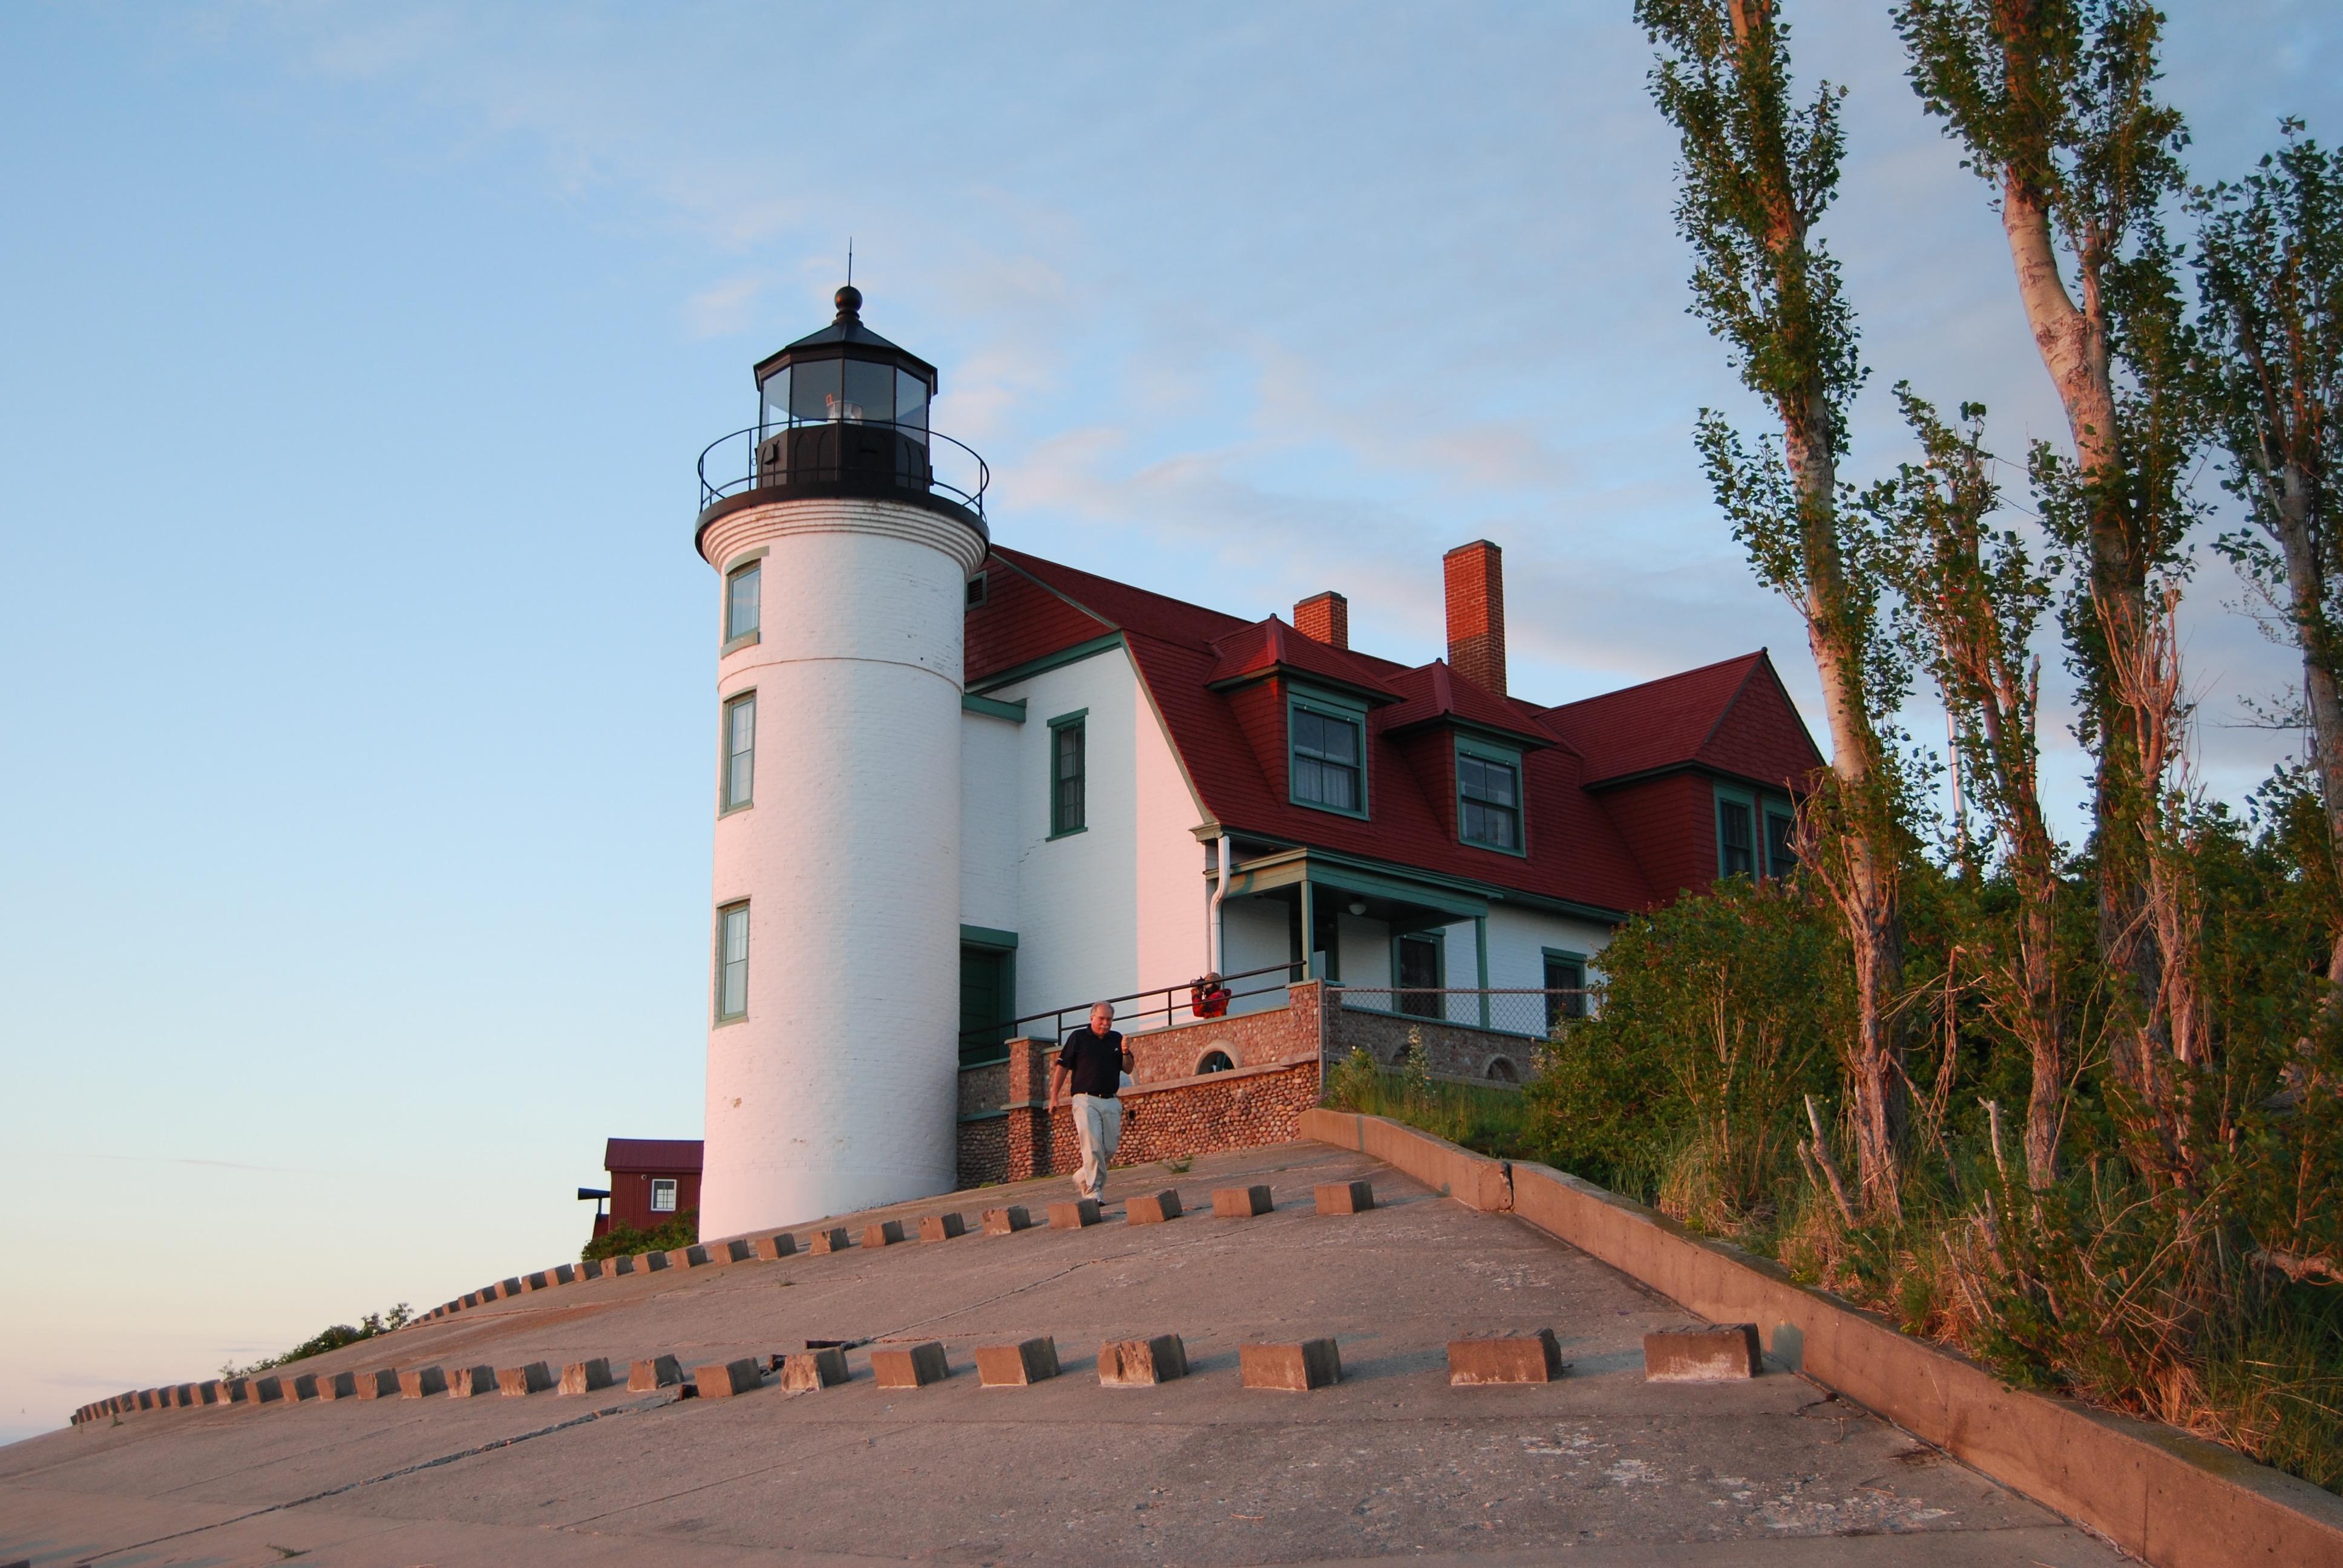 Michigan benzie county benzonia - Point Betsie Lighthouse